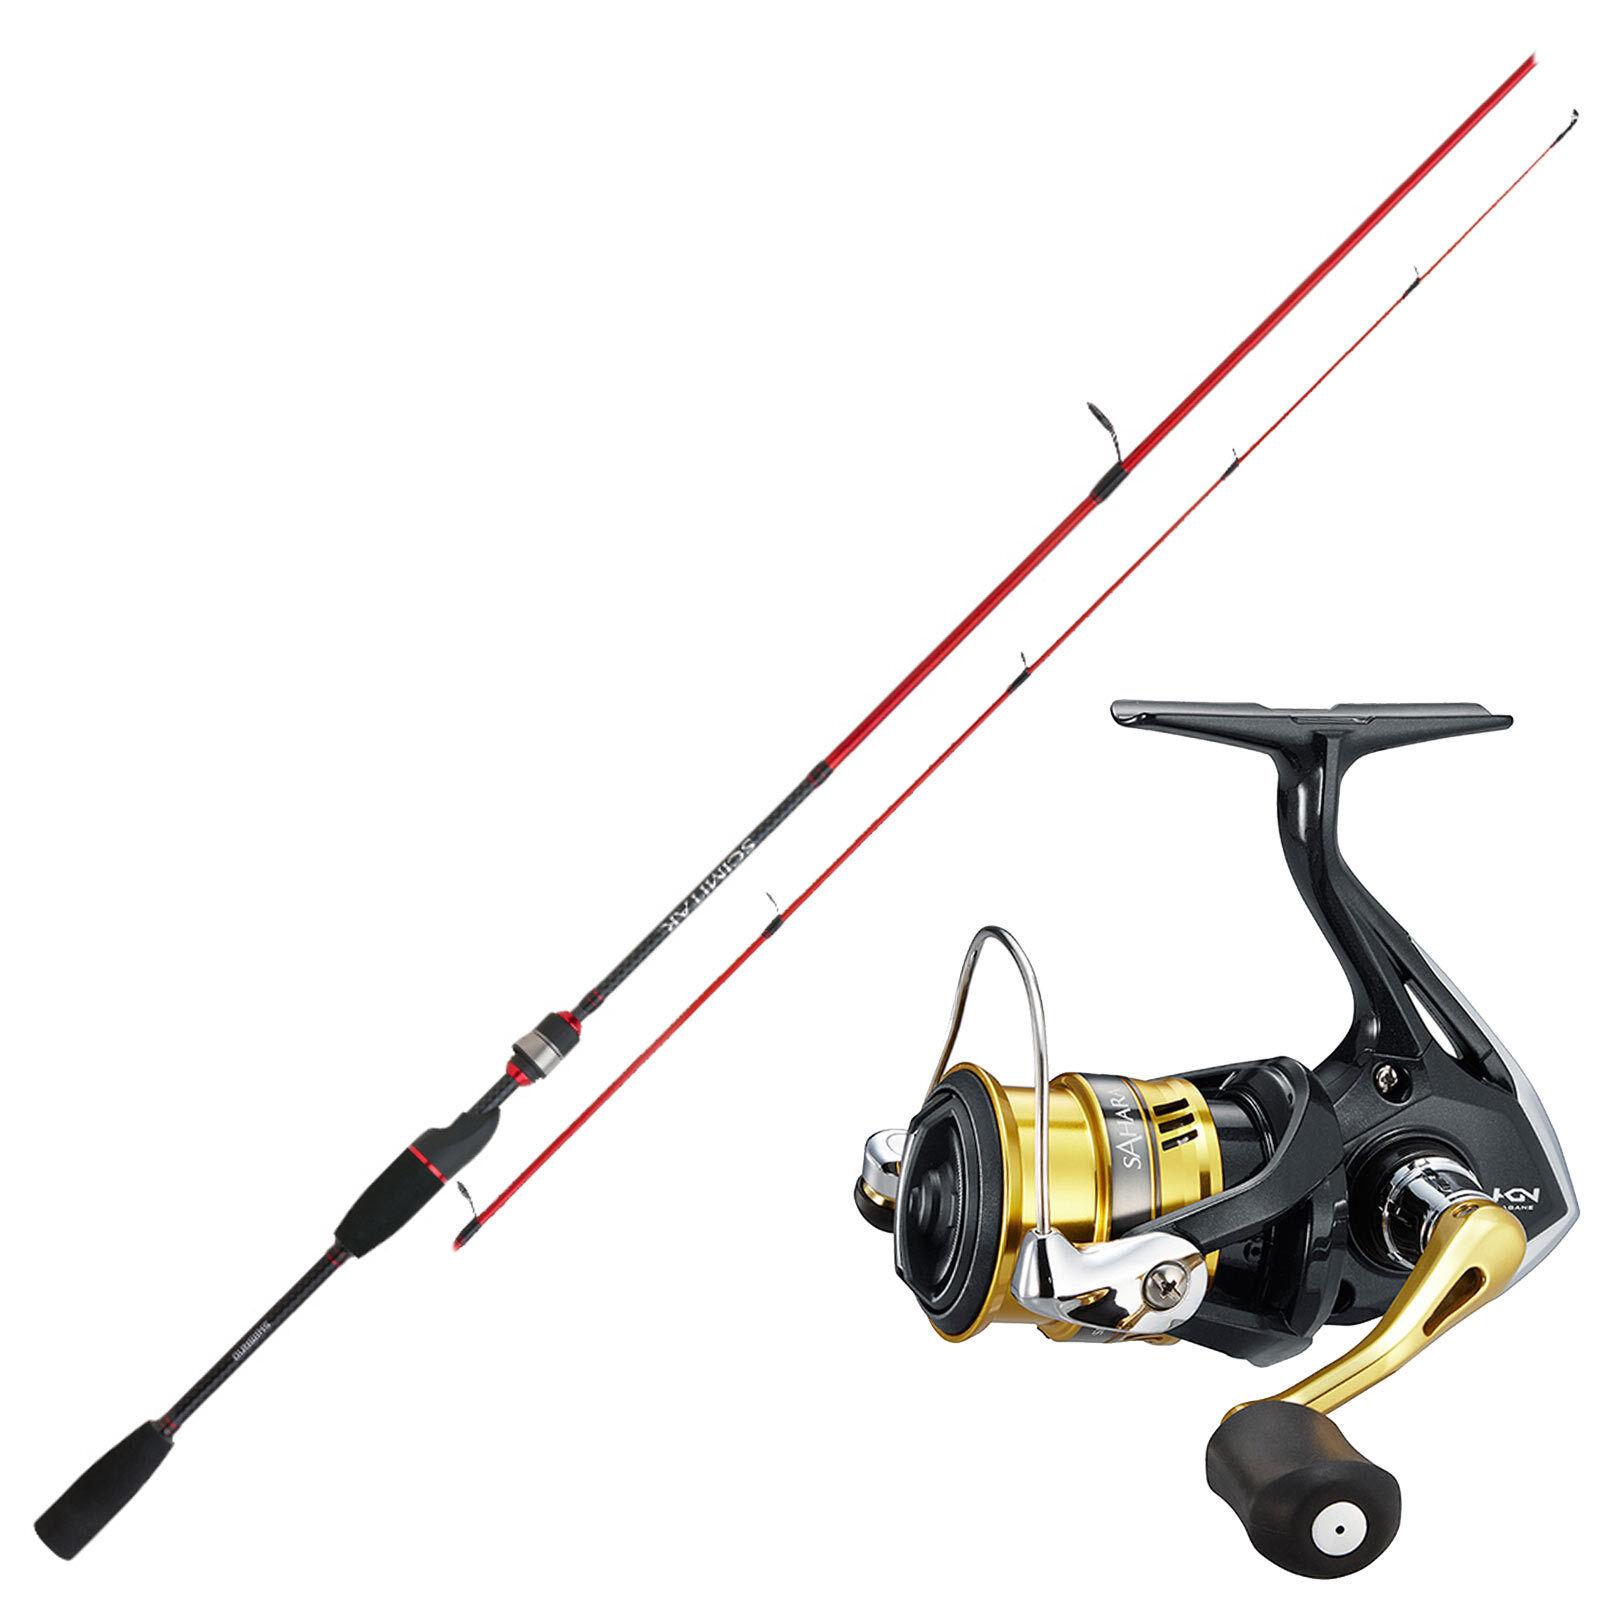 Girar la varilla con combo de - pesca de la lucioperca - de Cocherete Shimano pesca pesca Shimano set profesional